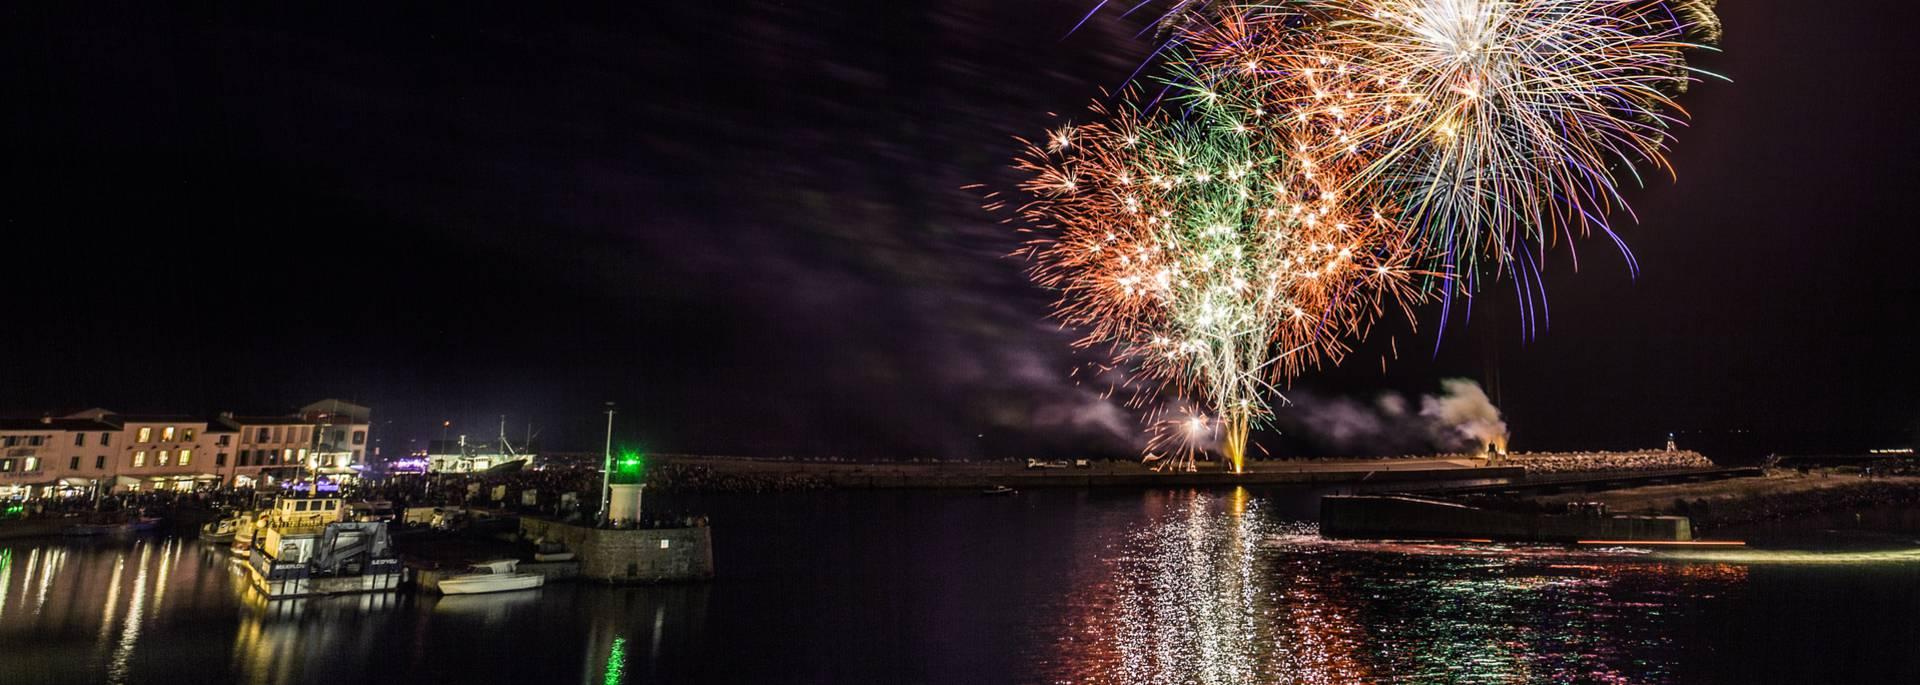 Feuerwerk in Port-Joinville, Ile d'Yeu